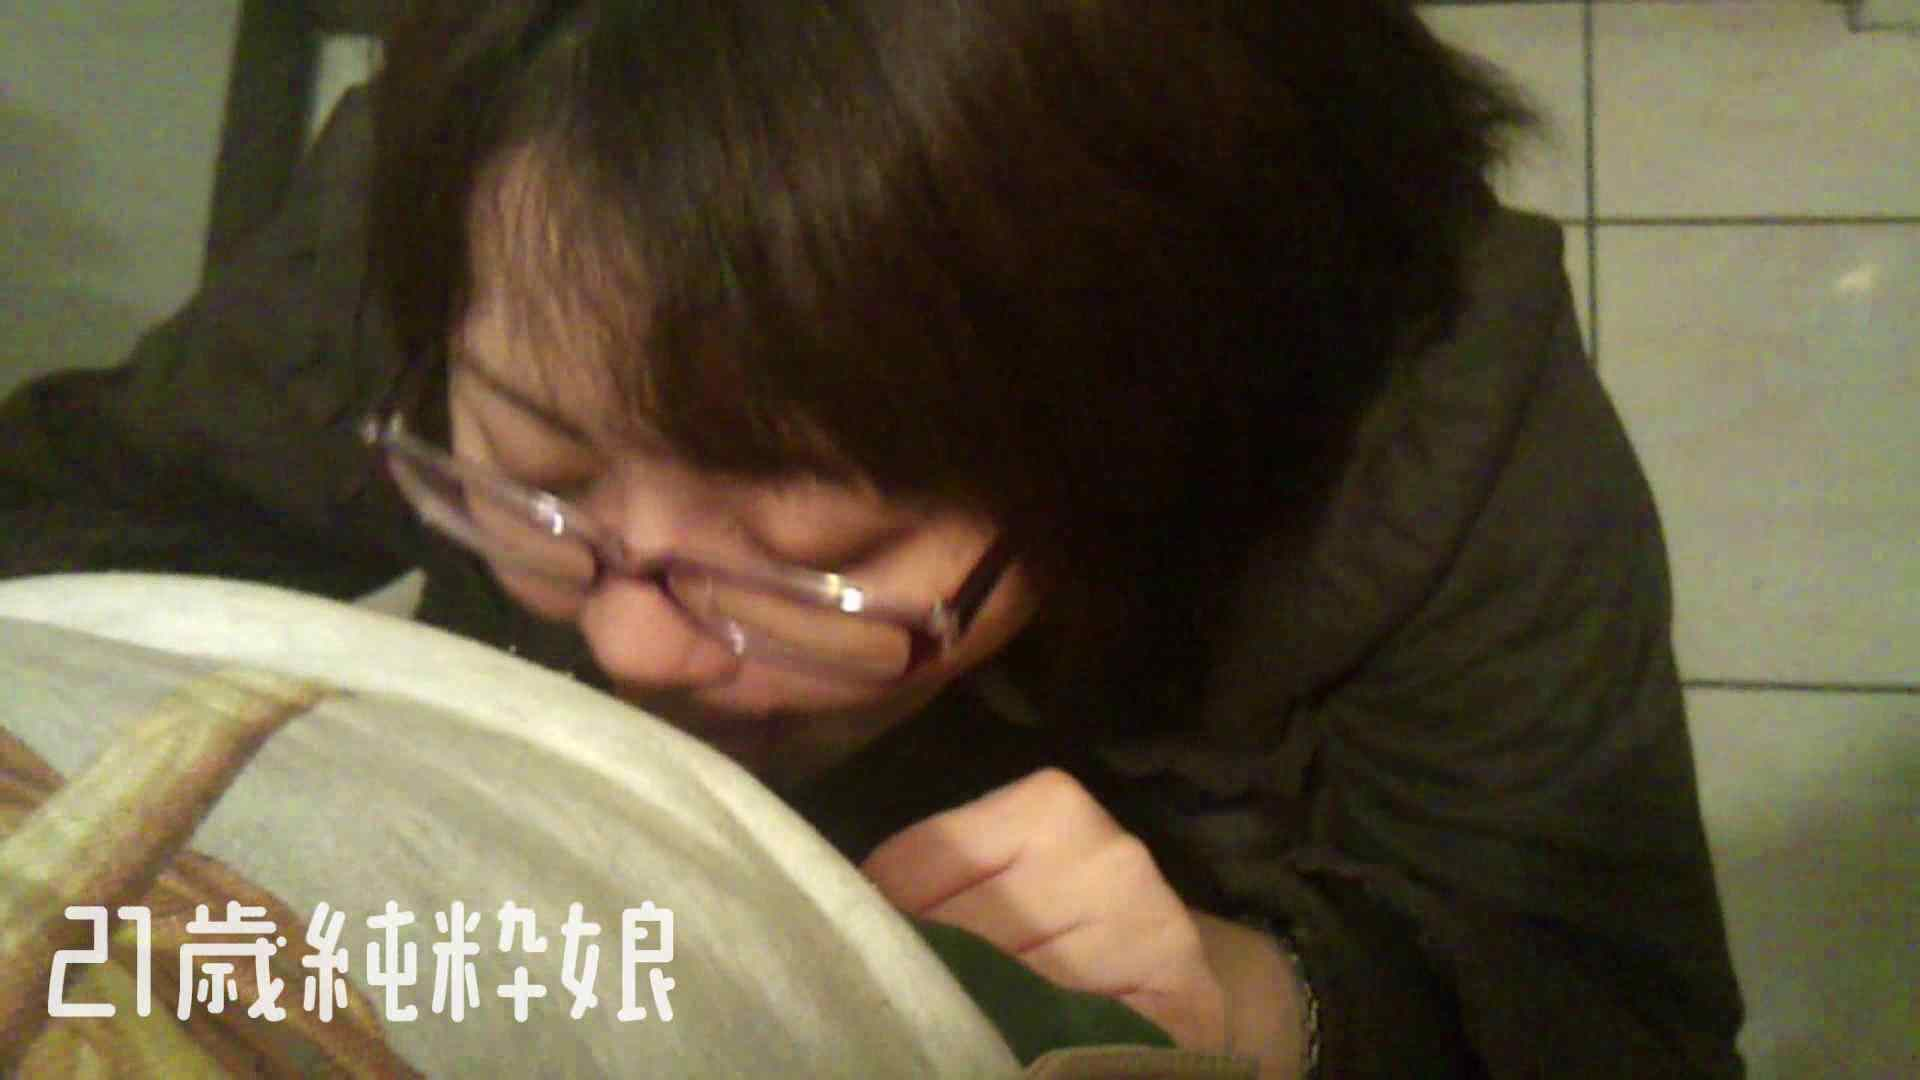 Gカップ21歳純粋嬢第2弾Vol.5 性欲丸出し | 学校  101pic 32